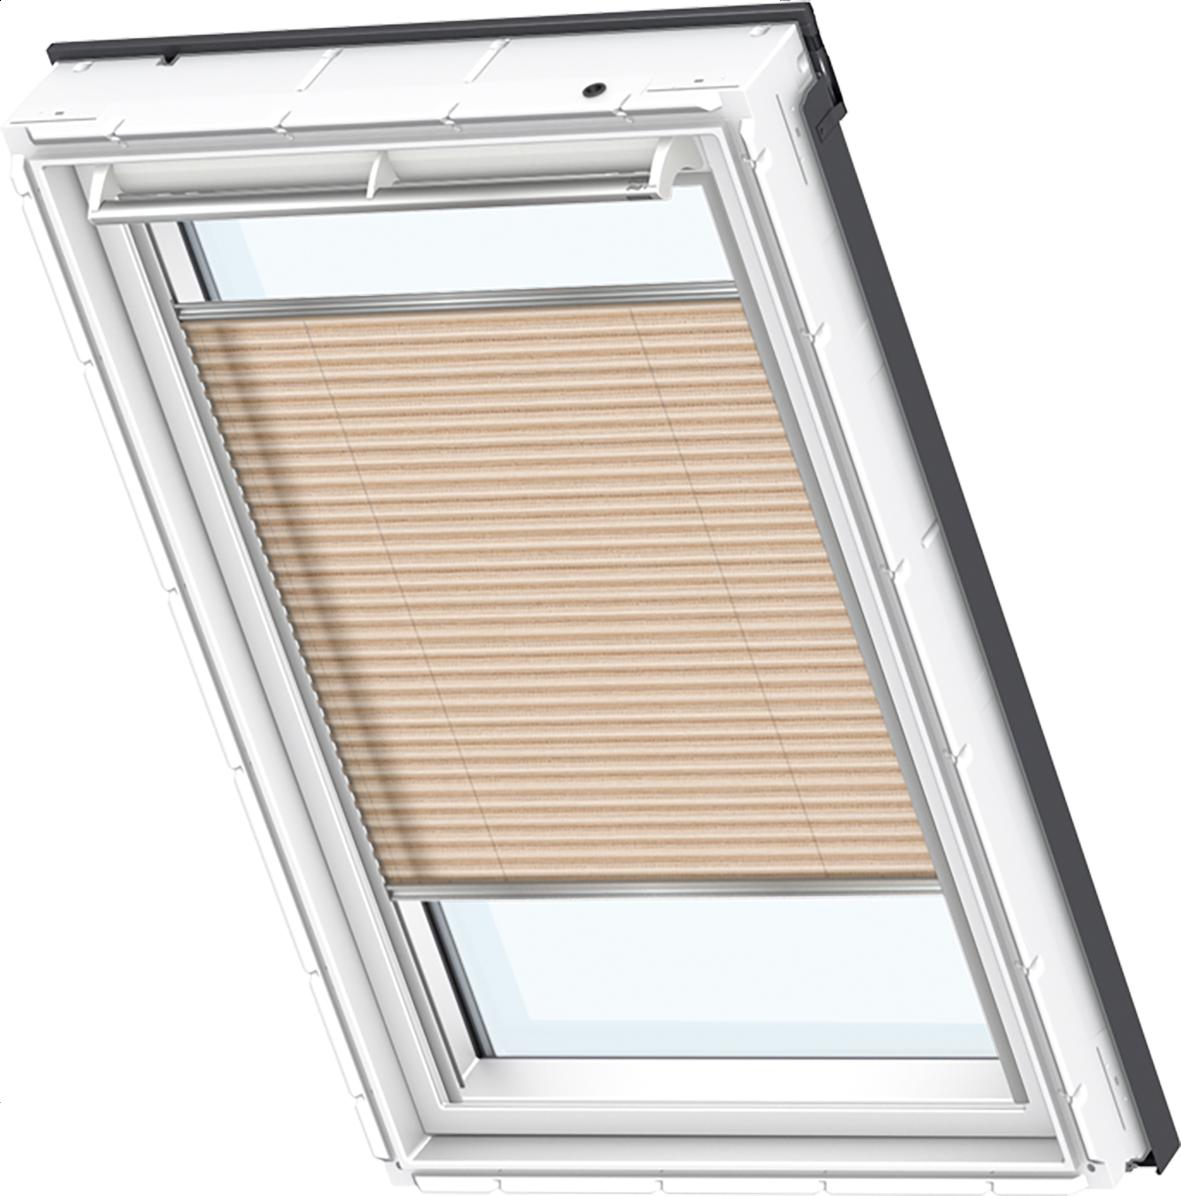 Orig Velux Dachfenster Plissee Faltstores Faltrollo 1261 1261 1261 1267 GGL GPL..GGU GPU.. 344653